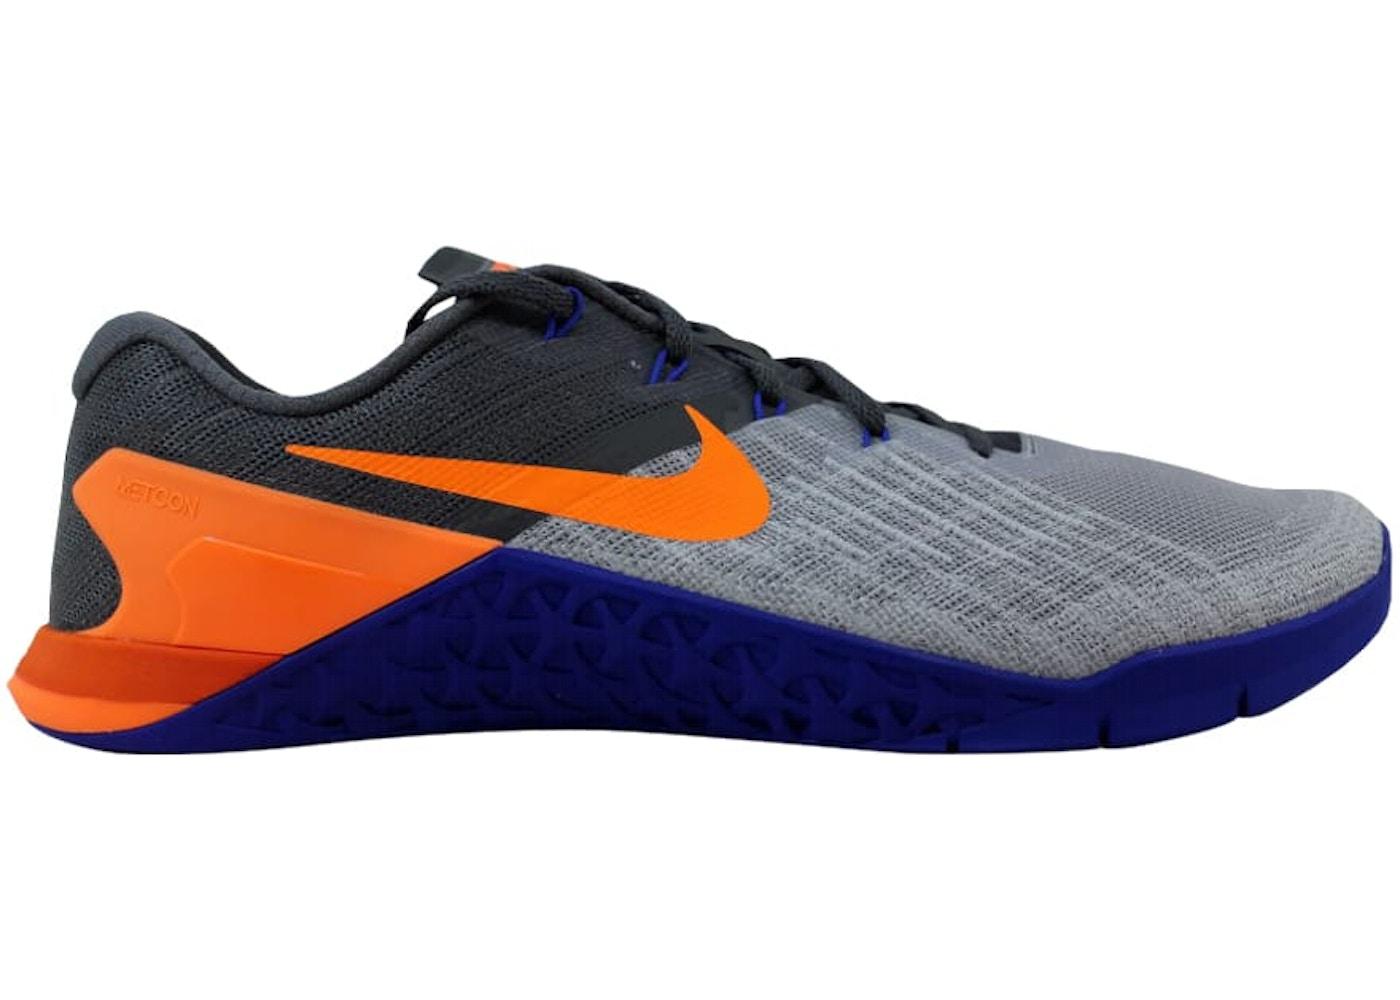 Nike Metcon 3 Wolf Grey Tart-Dark Grey - 852928-003 dc7d46171c12